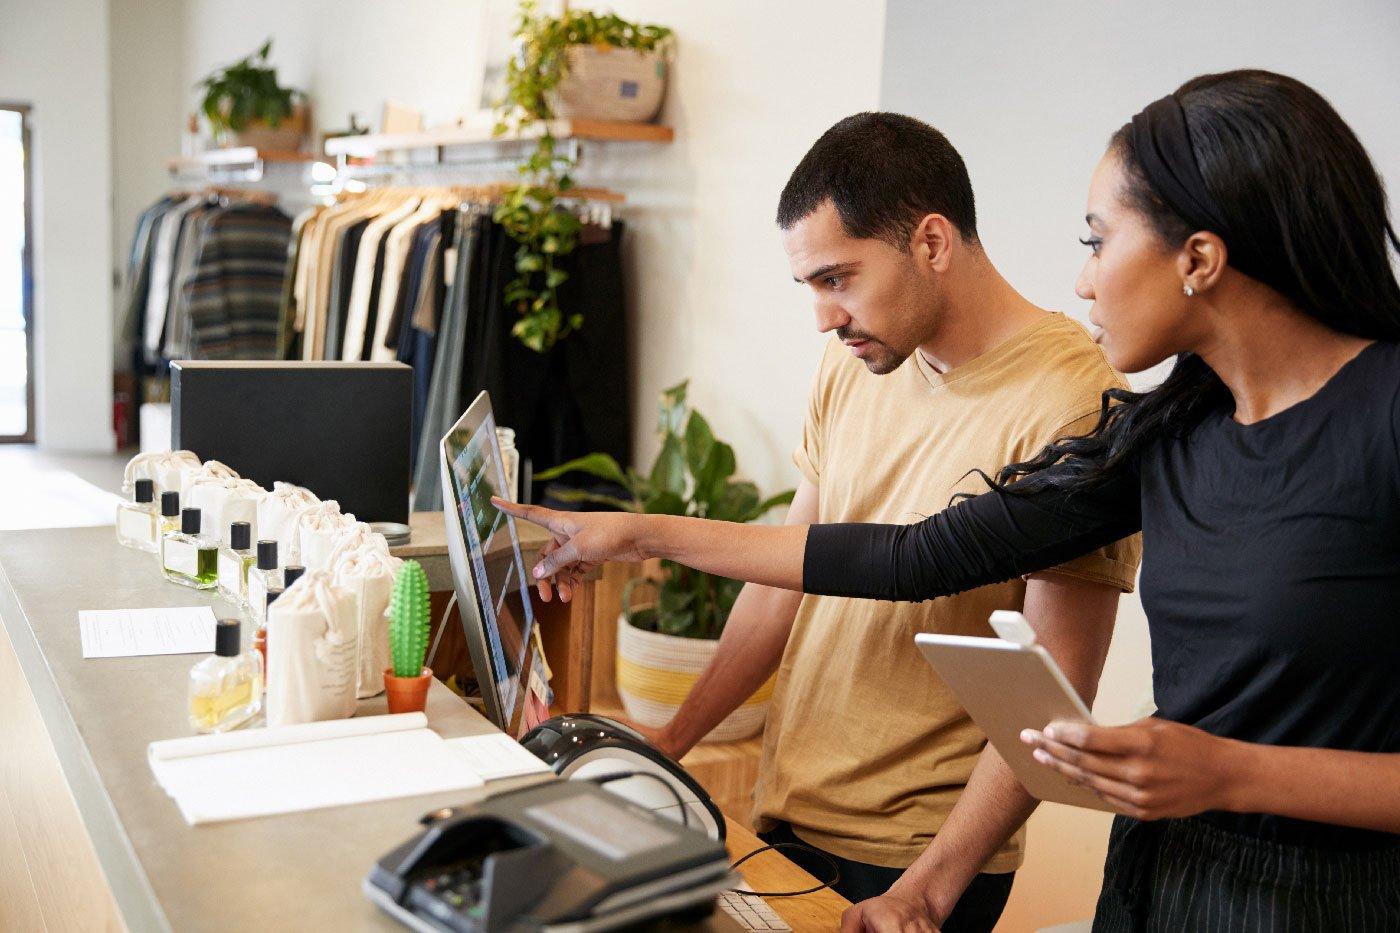 TRUNO-to-Acquire-Retail-Labor-Analytics-Software-Company